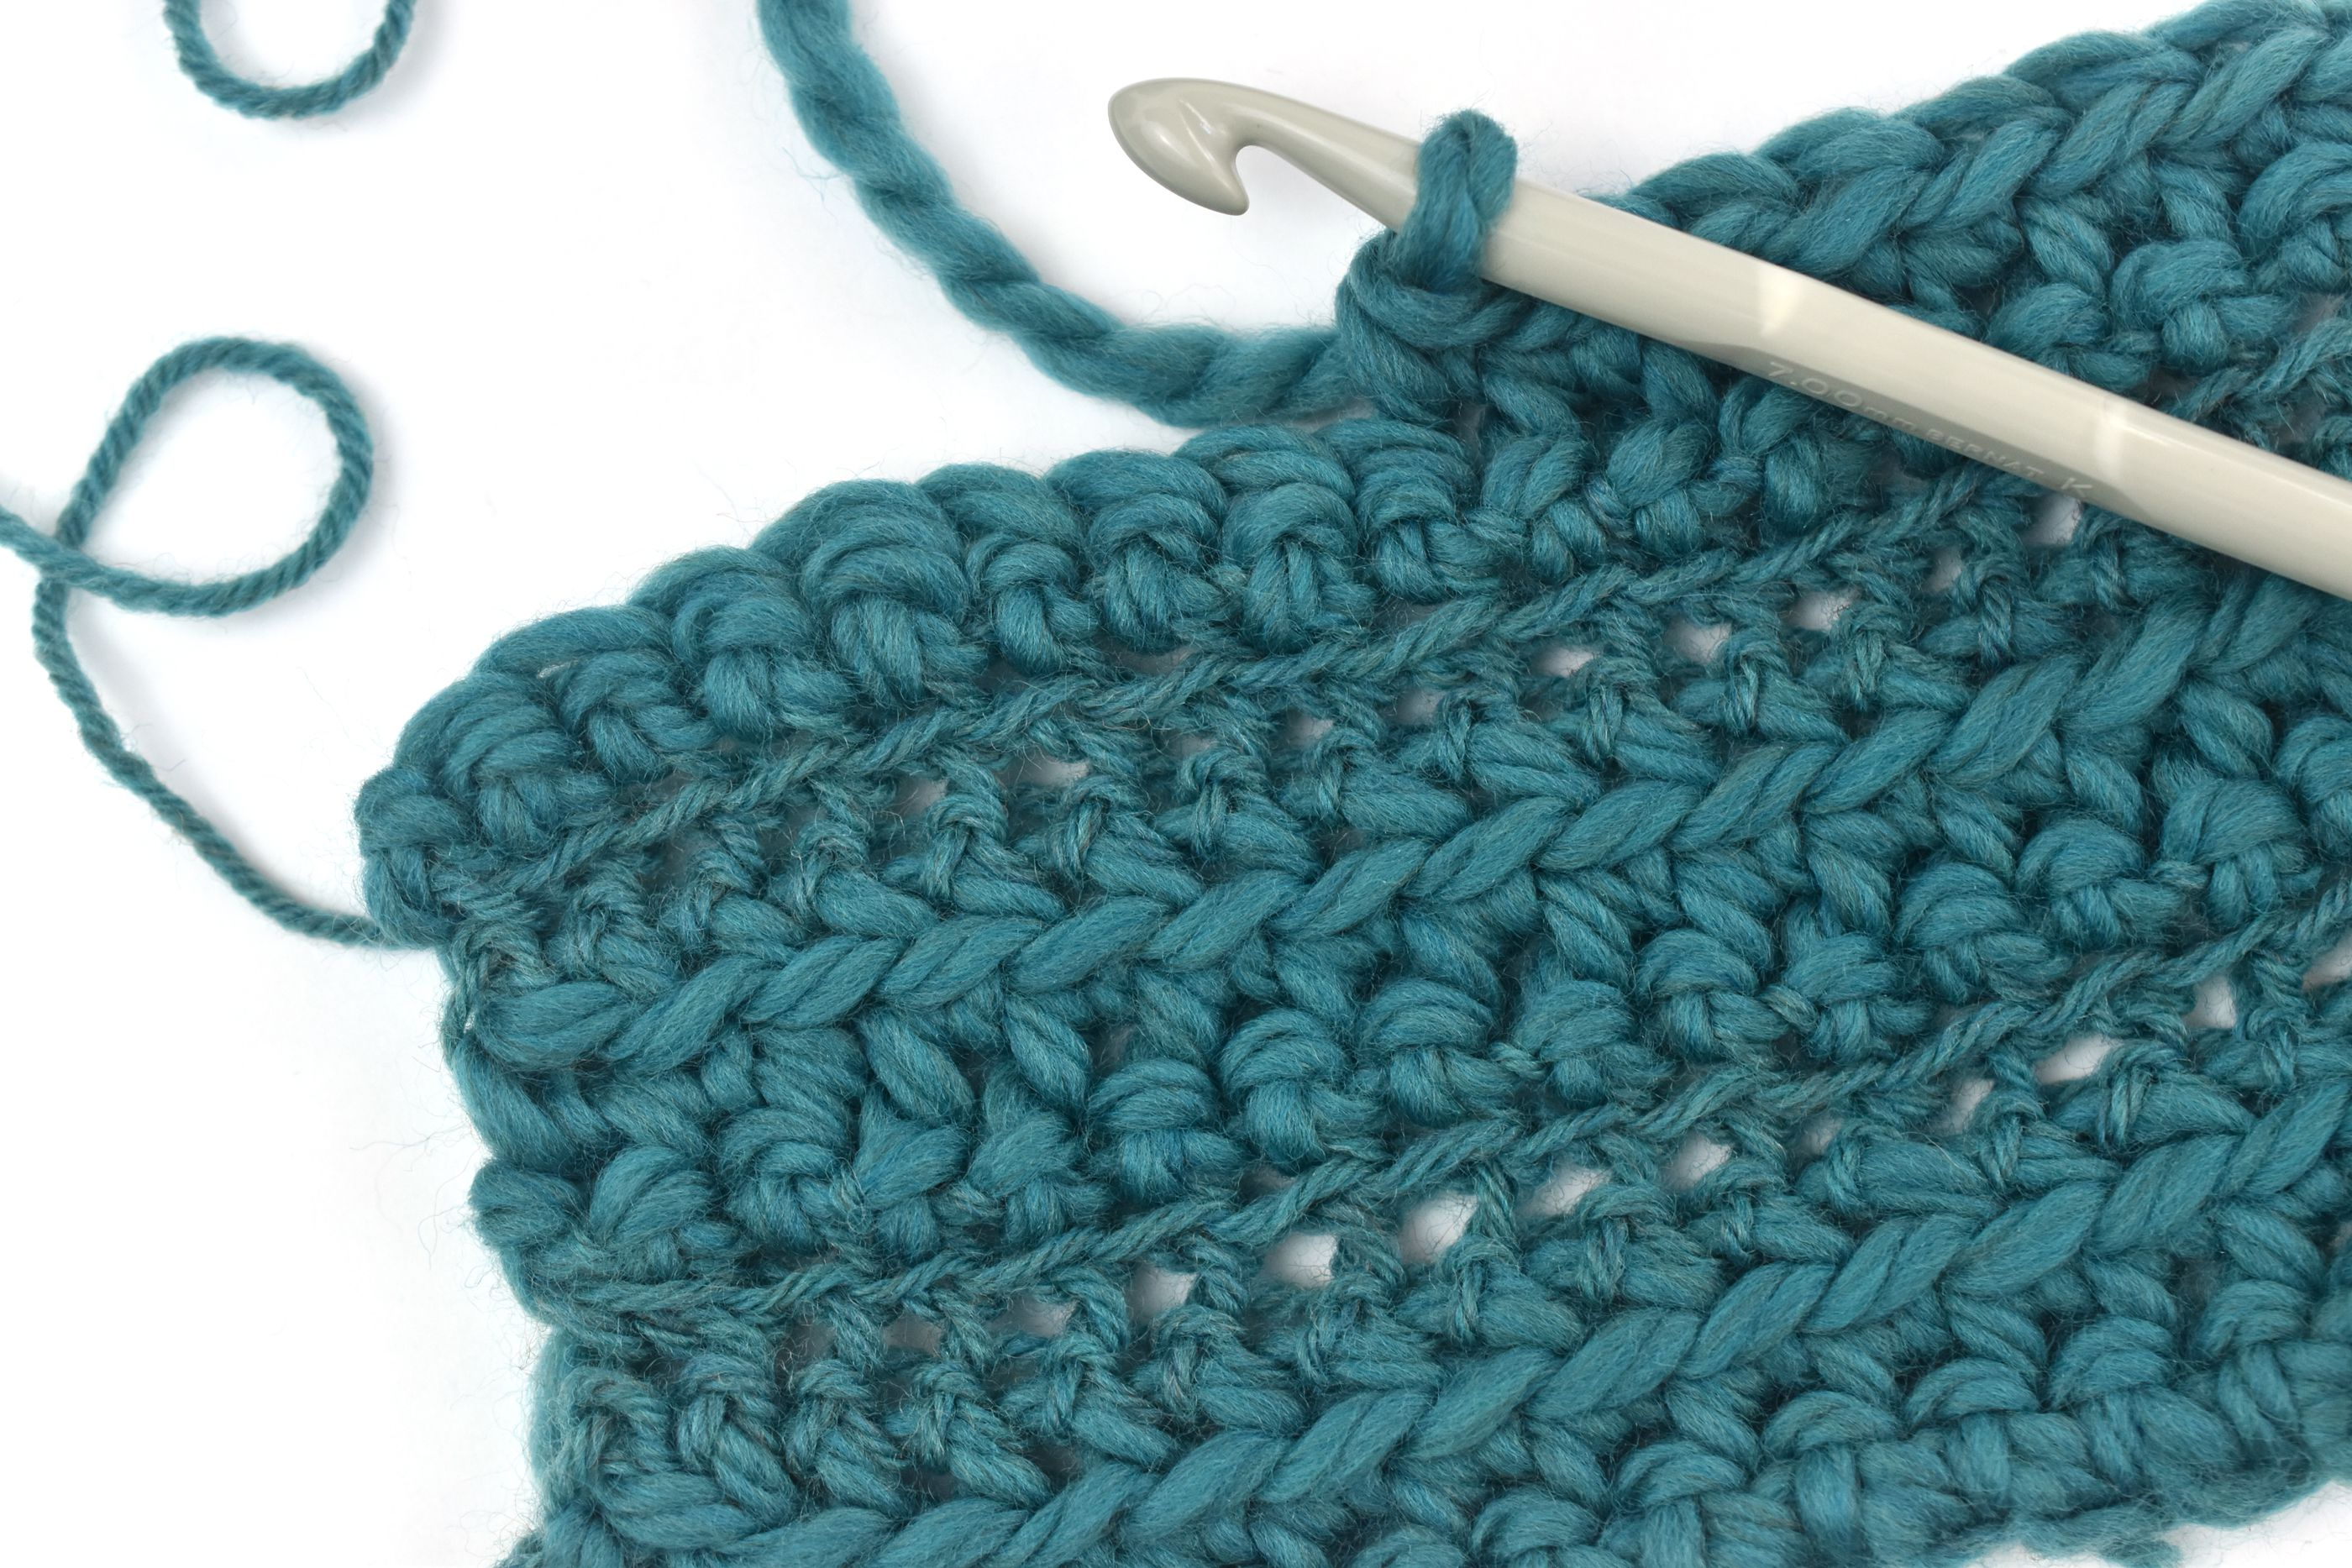 CrochetStitchPatterns ThickAndThin 5bca51f546e0fb00514d43e2